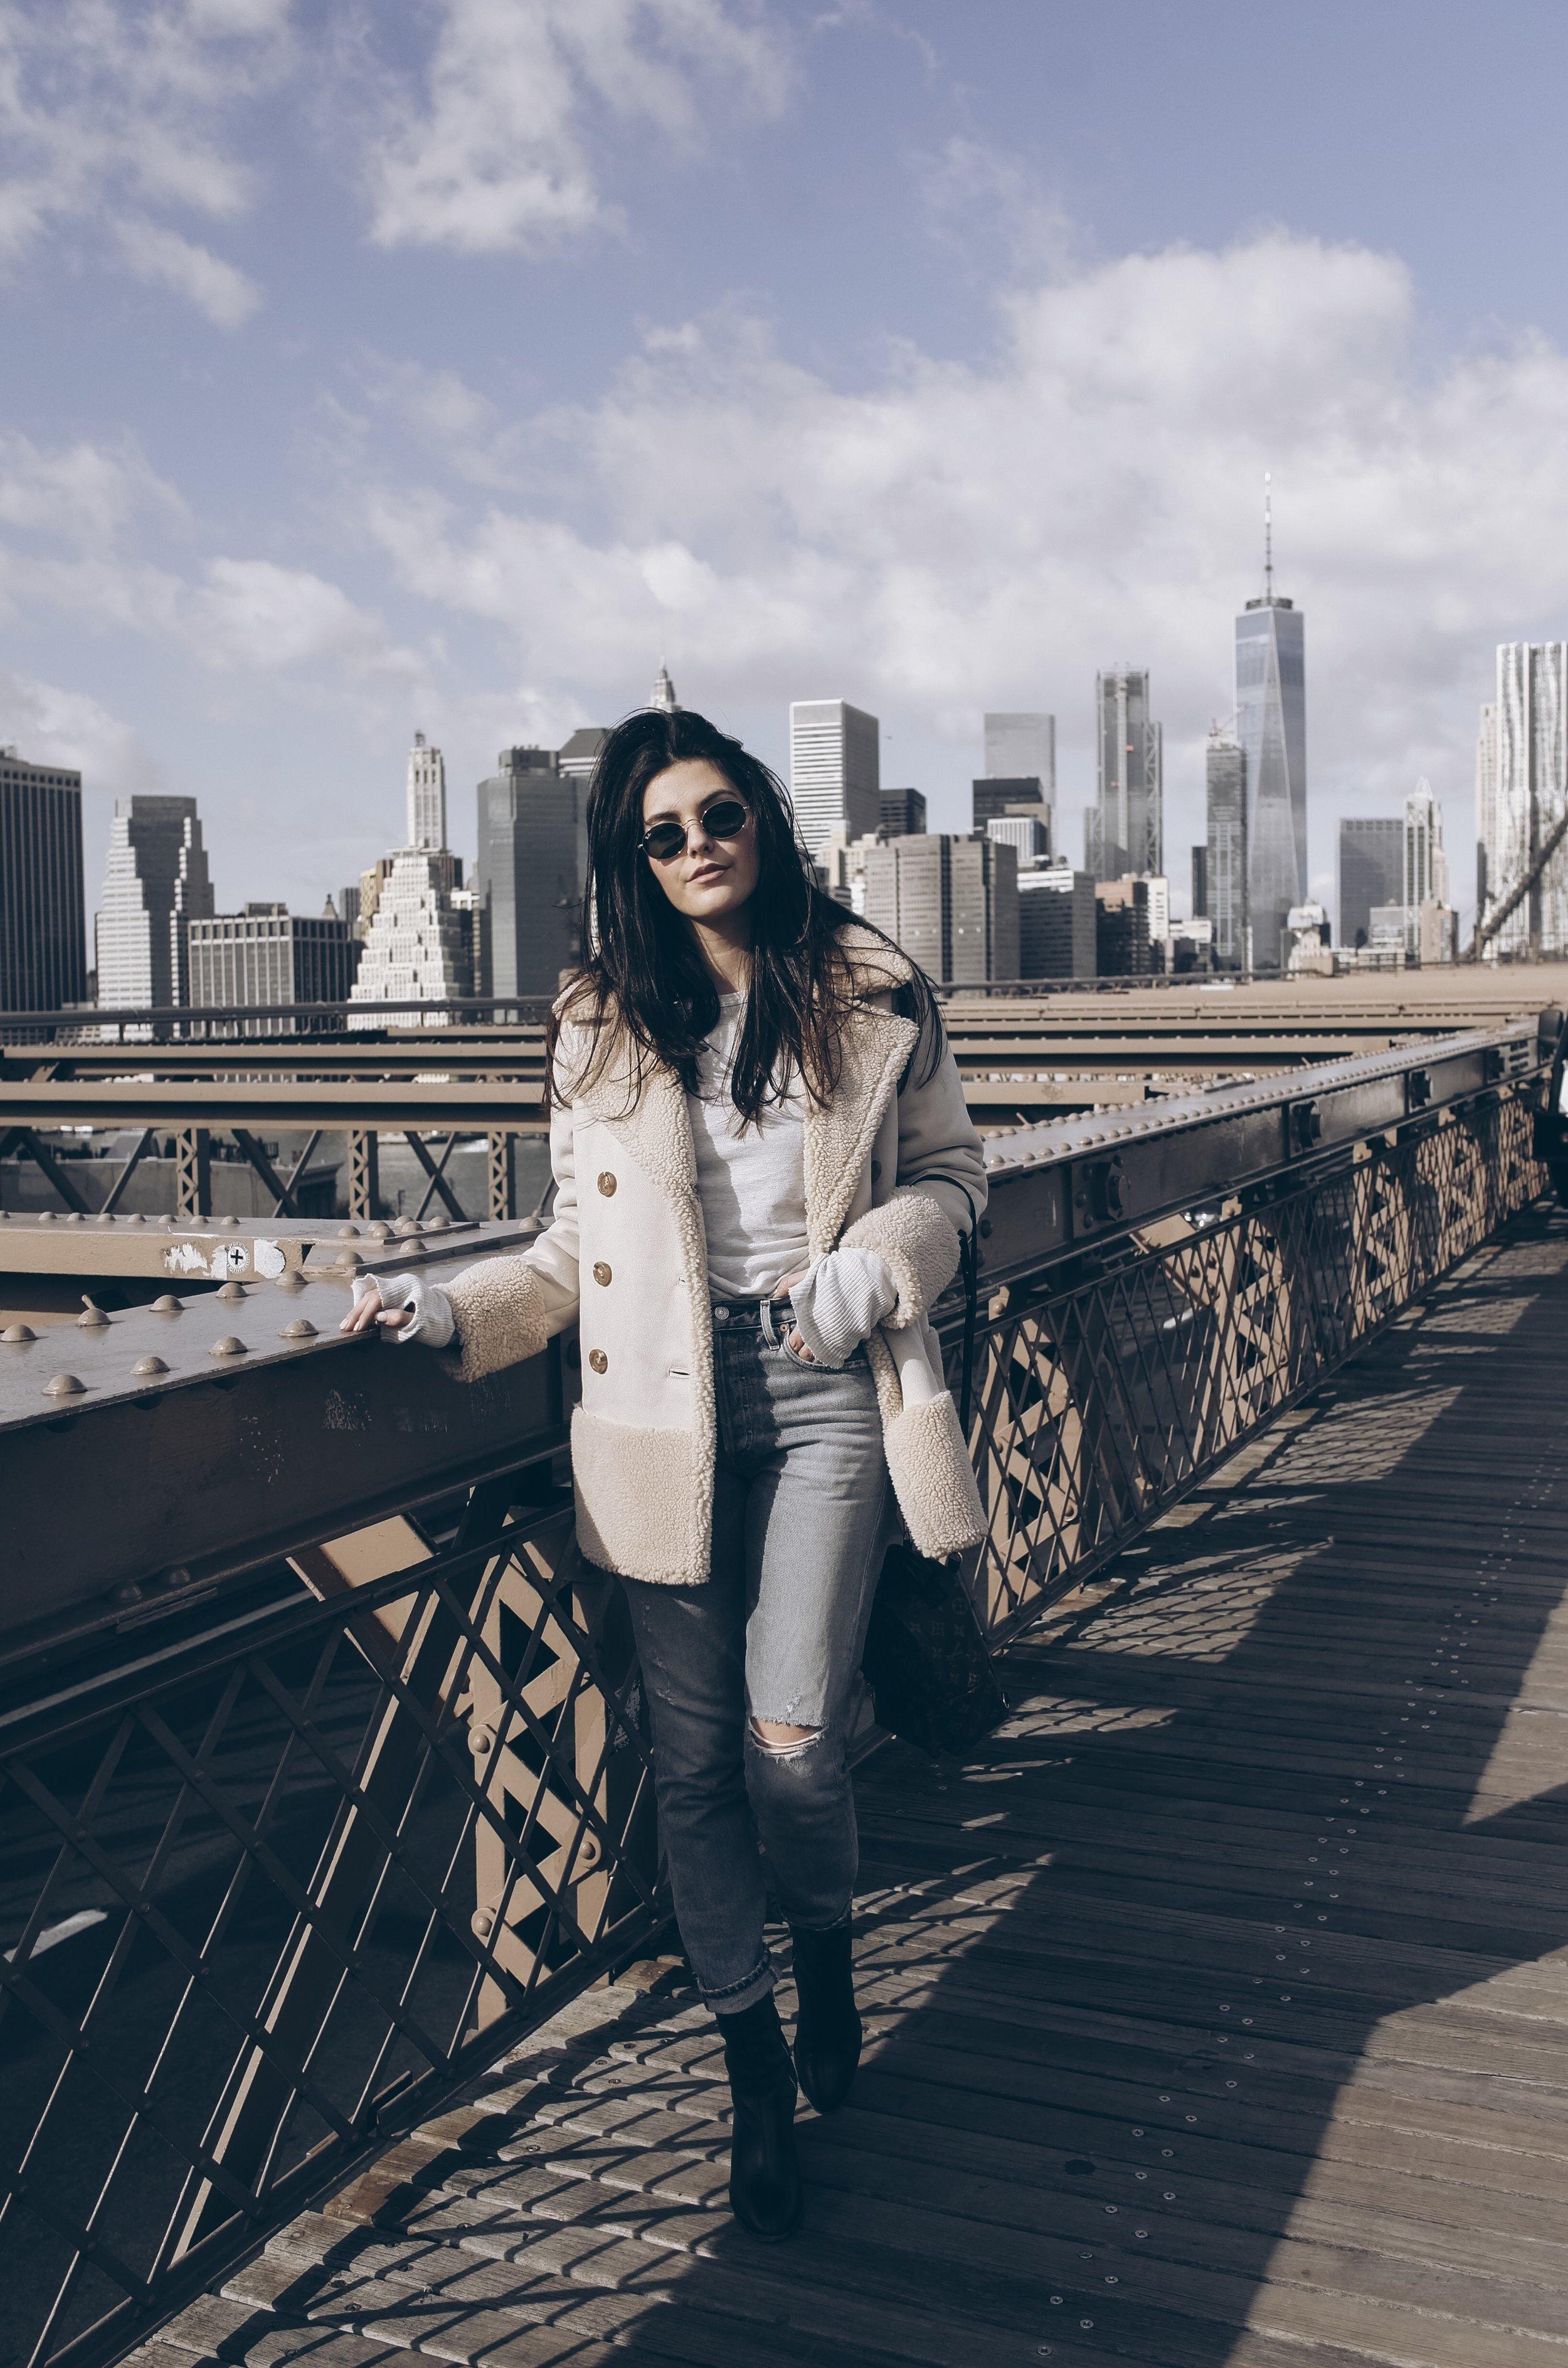 How to Practice Being Thankful Everyday | Julia Friedman on the Brooklyn Bridge.